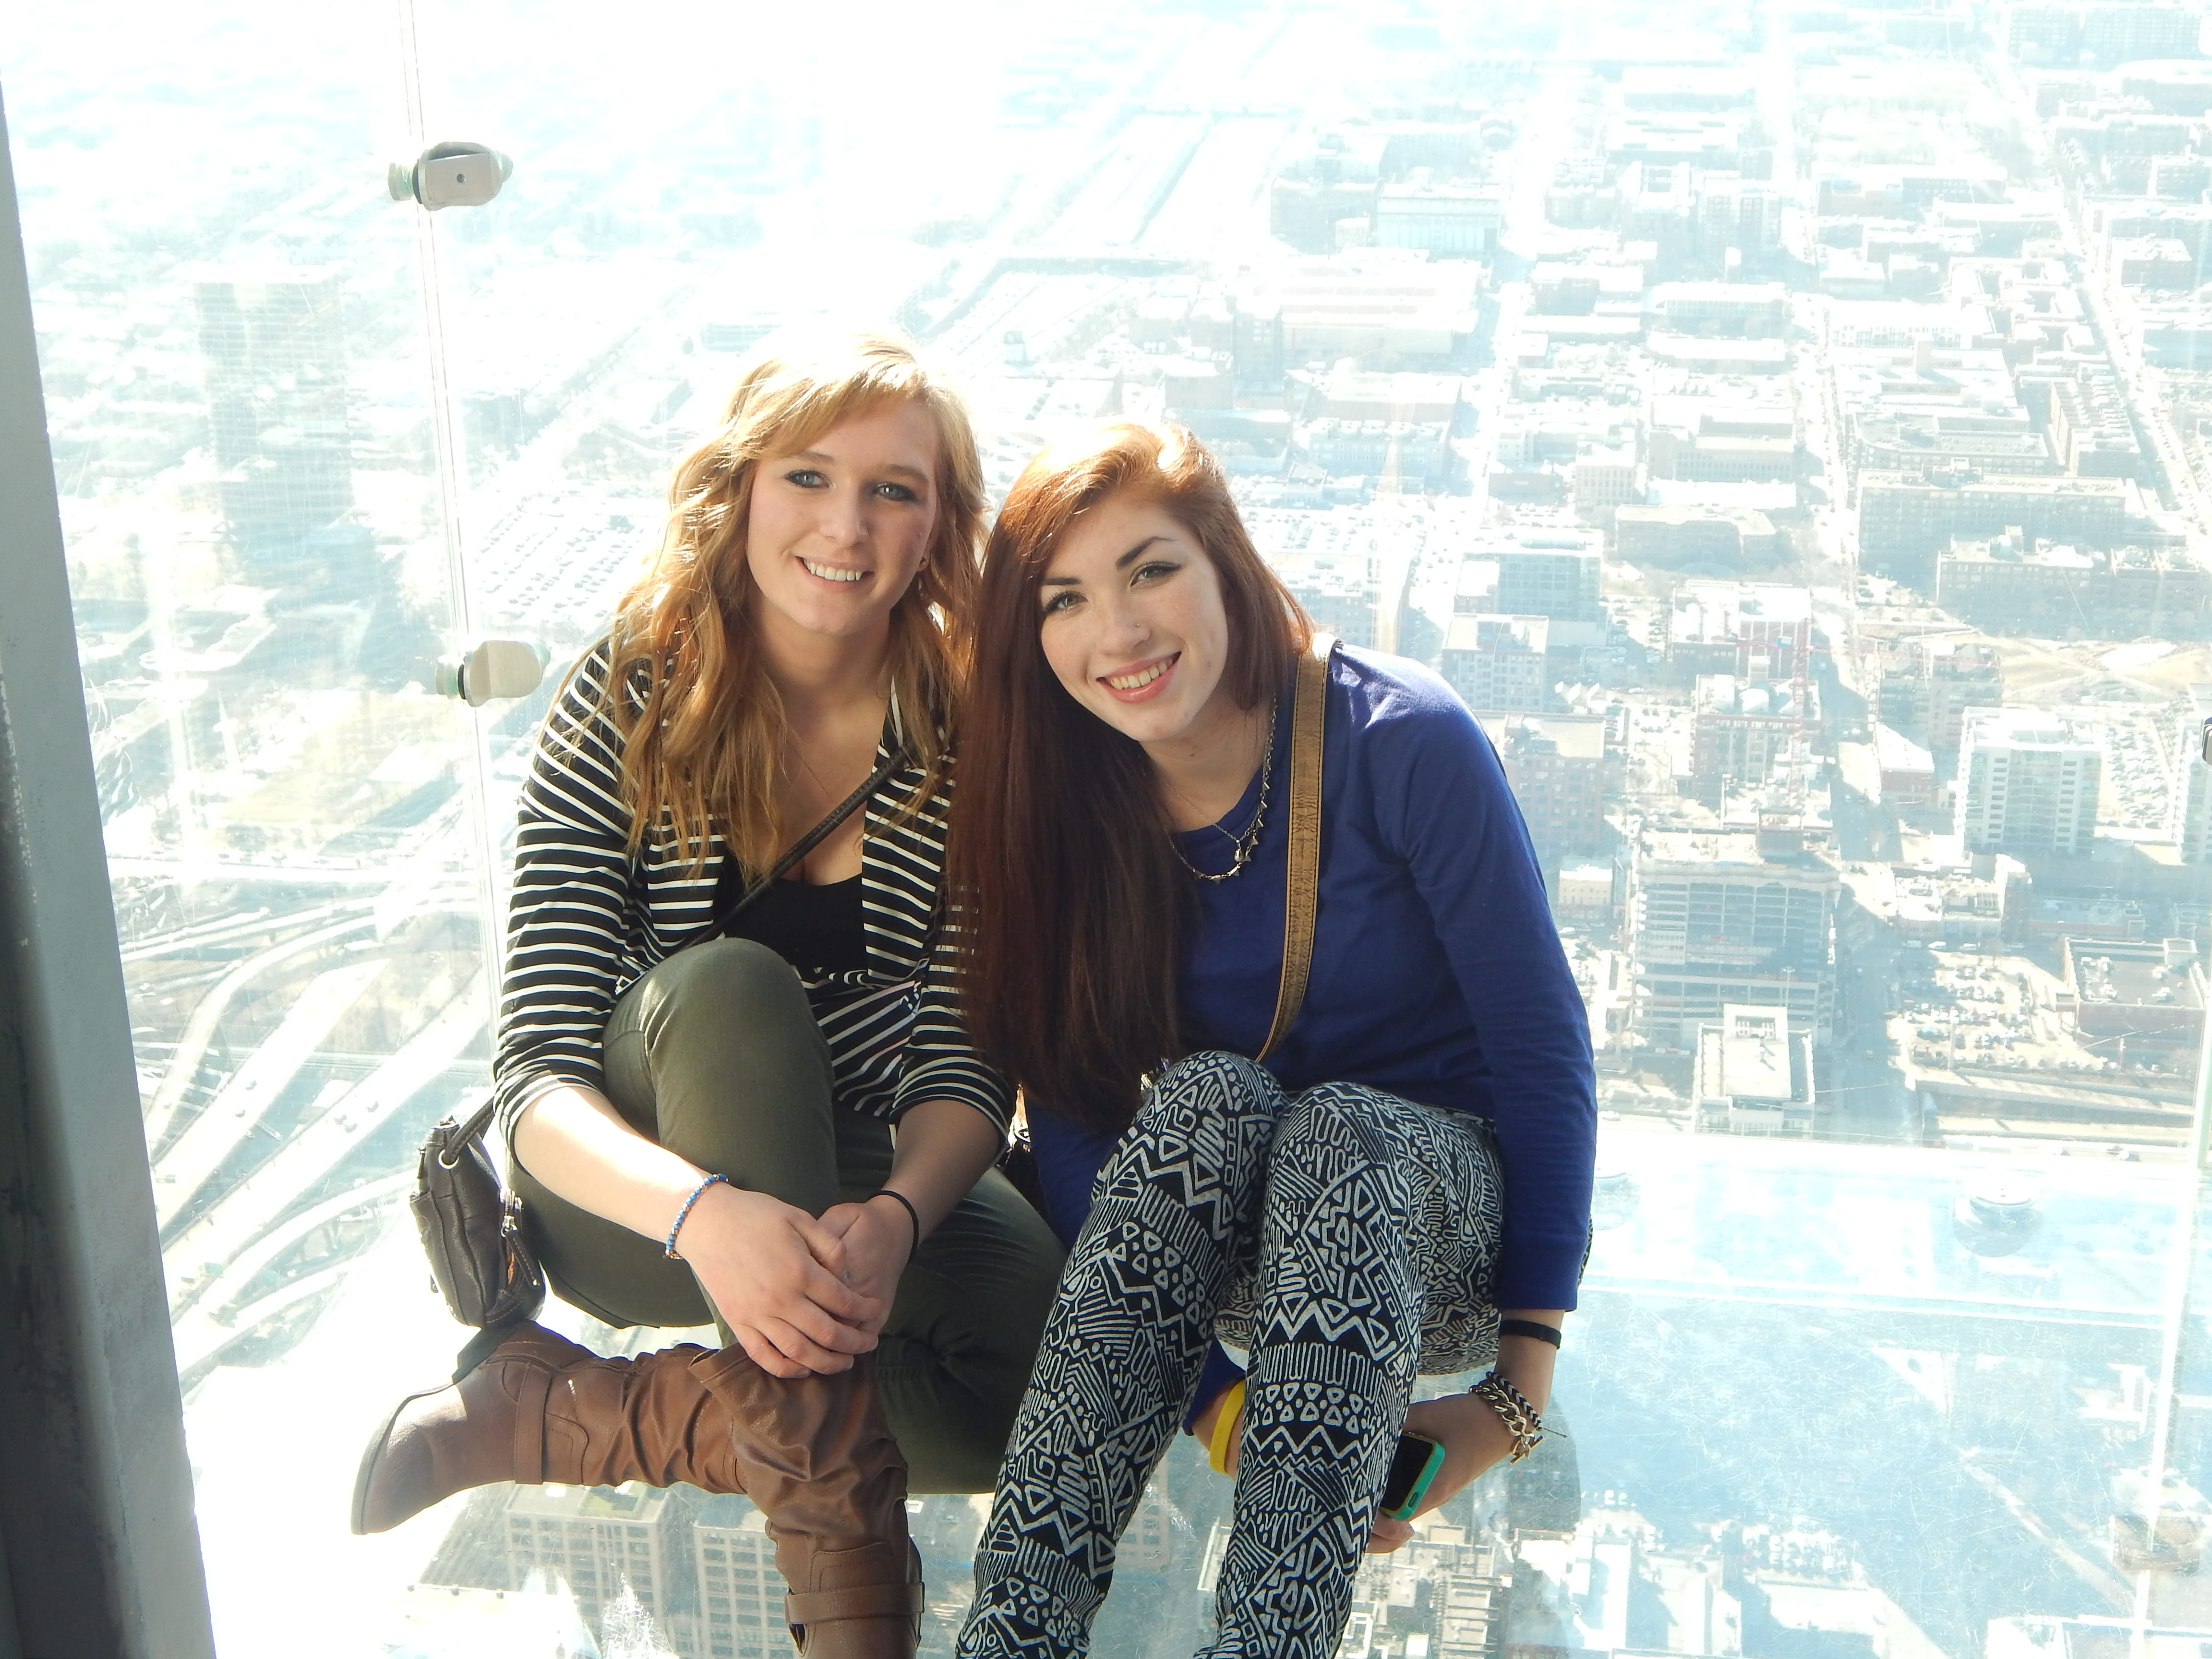 Chicago Trip: Girls in Glass-bottom Elevator